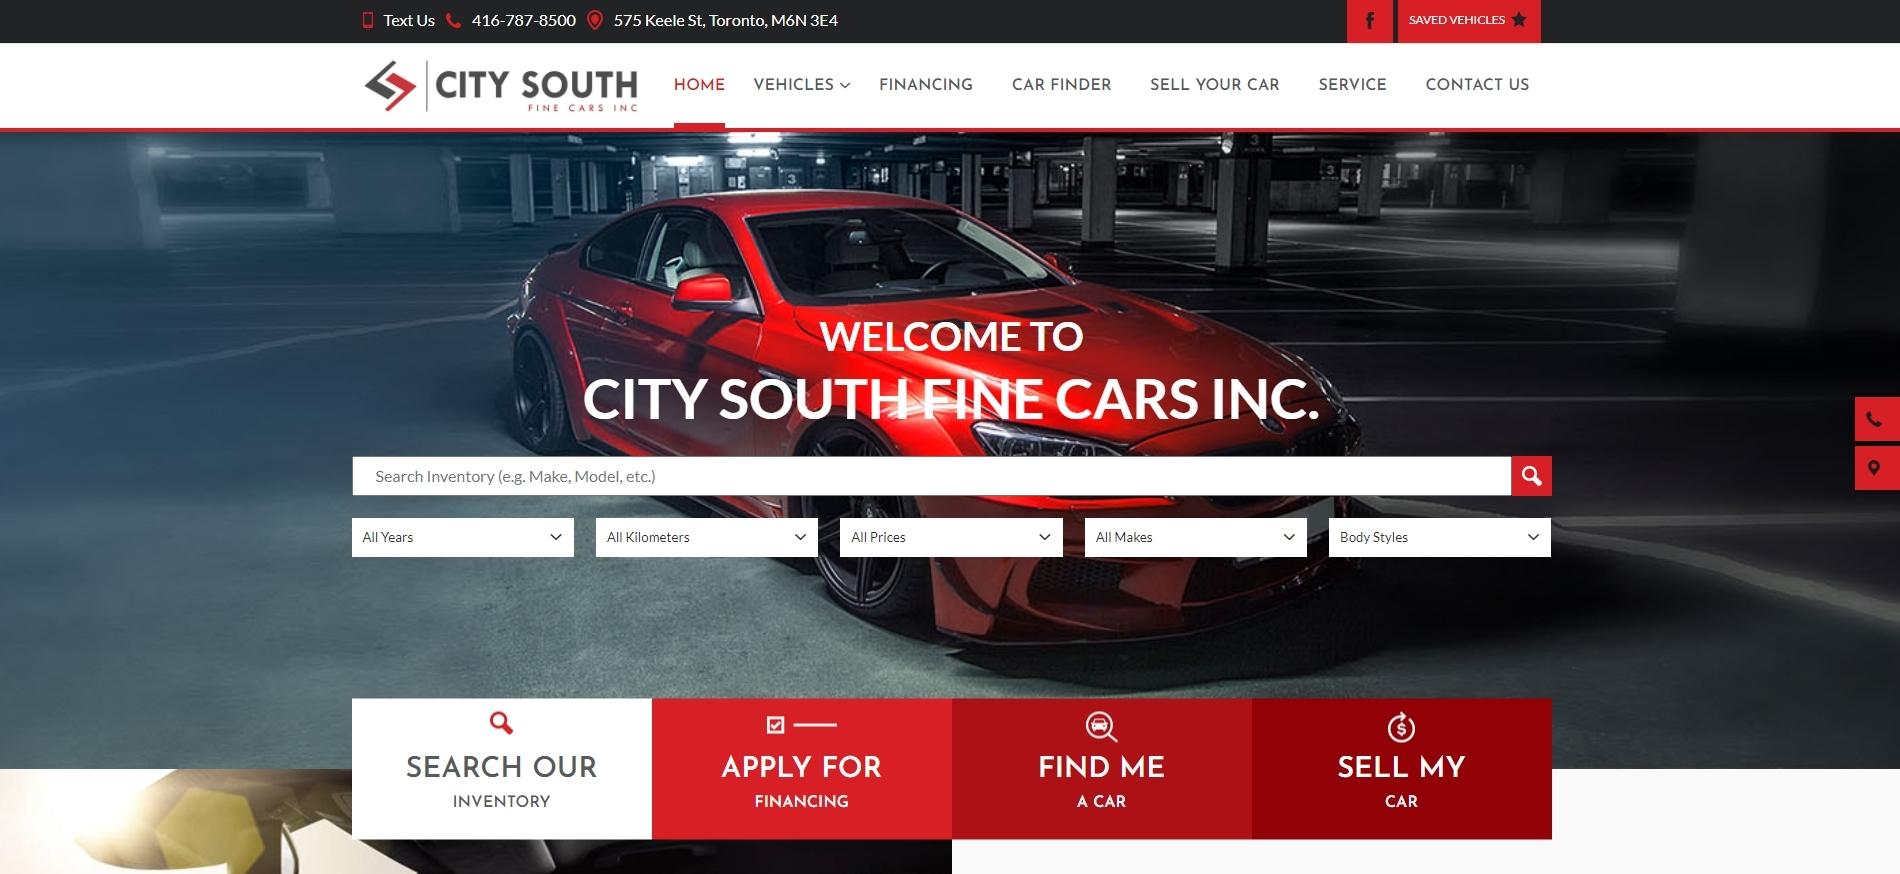 City South Fine Cars Inc. -used car dealerships